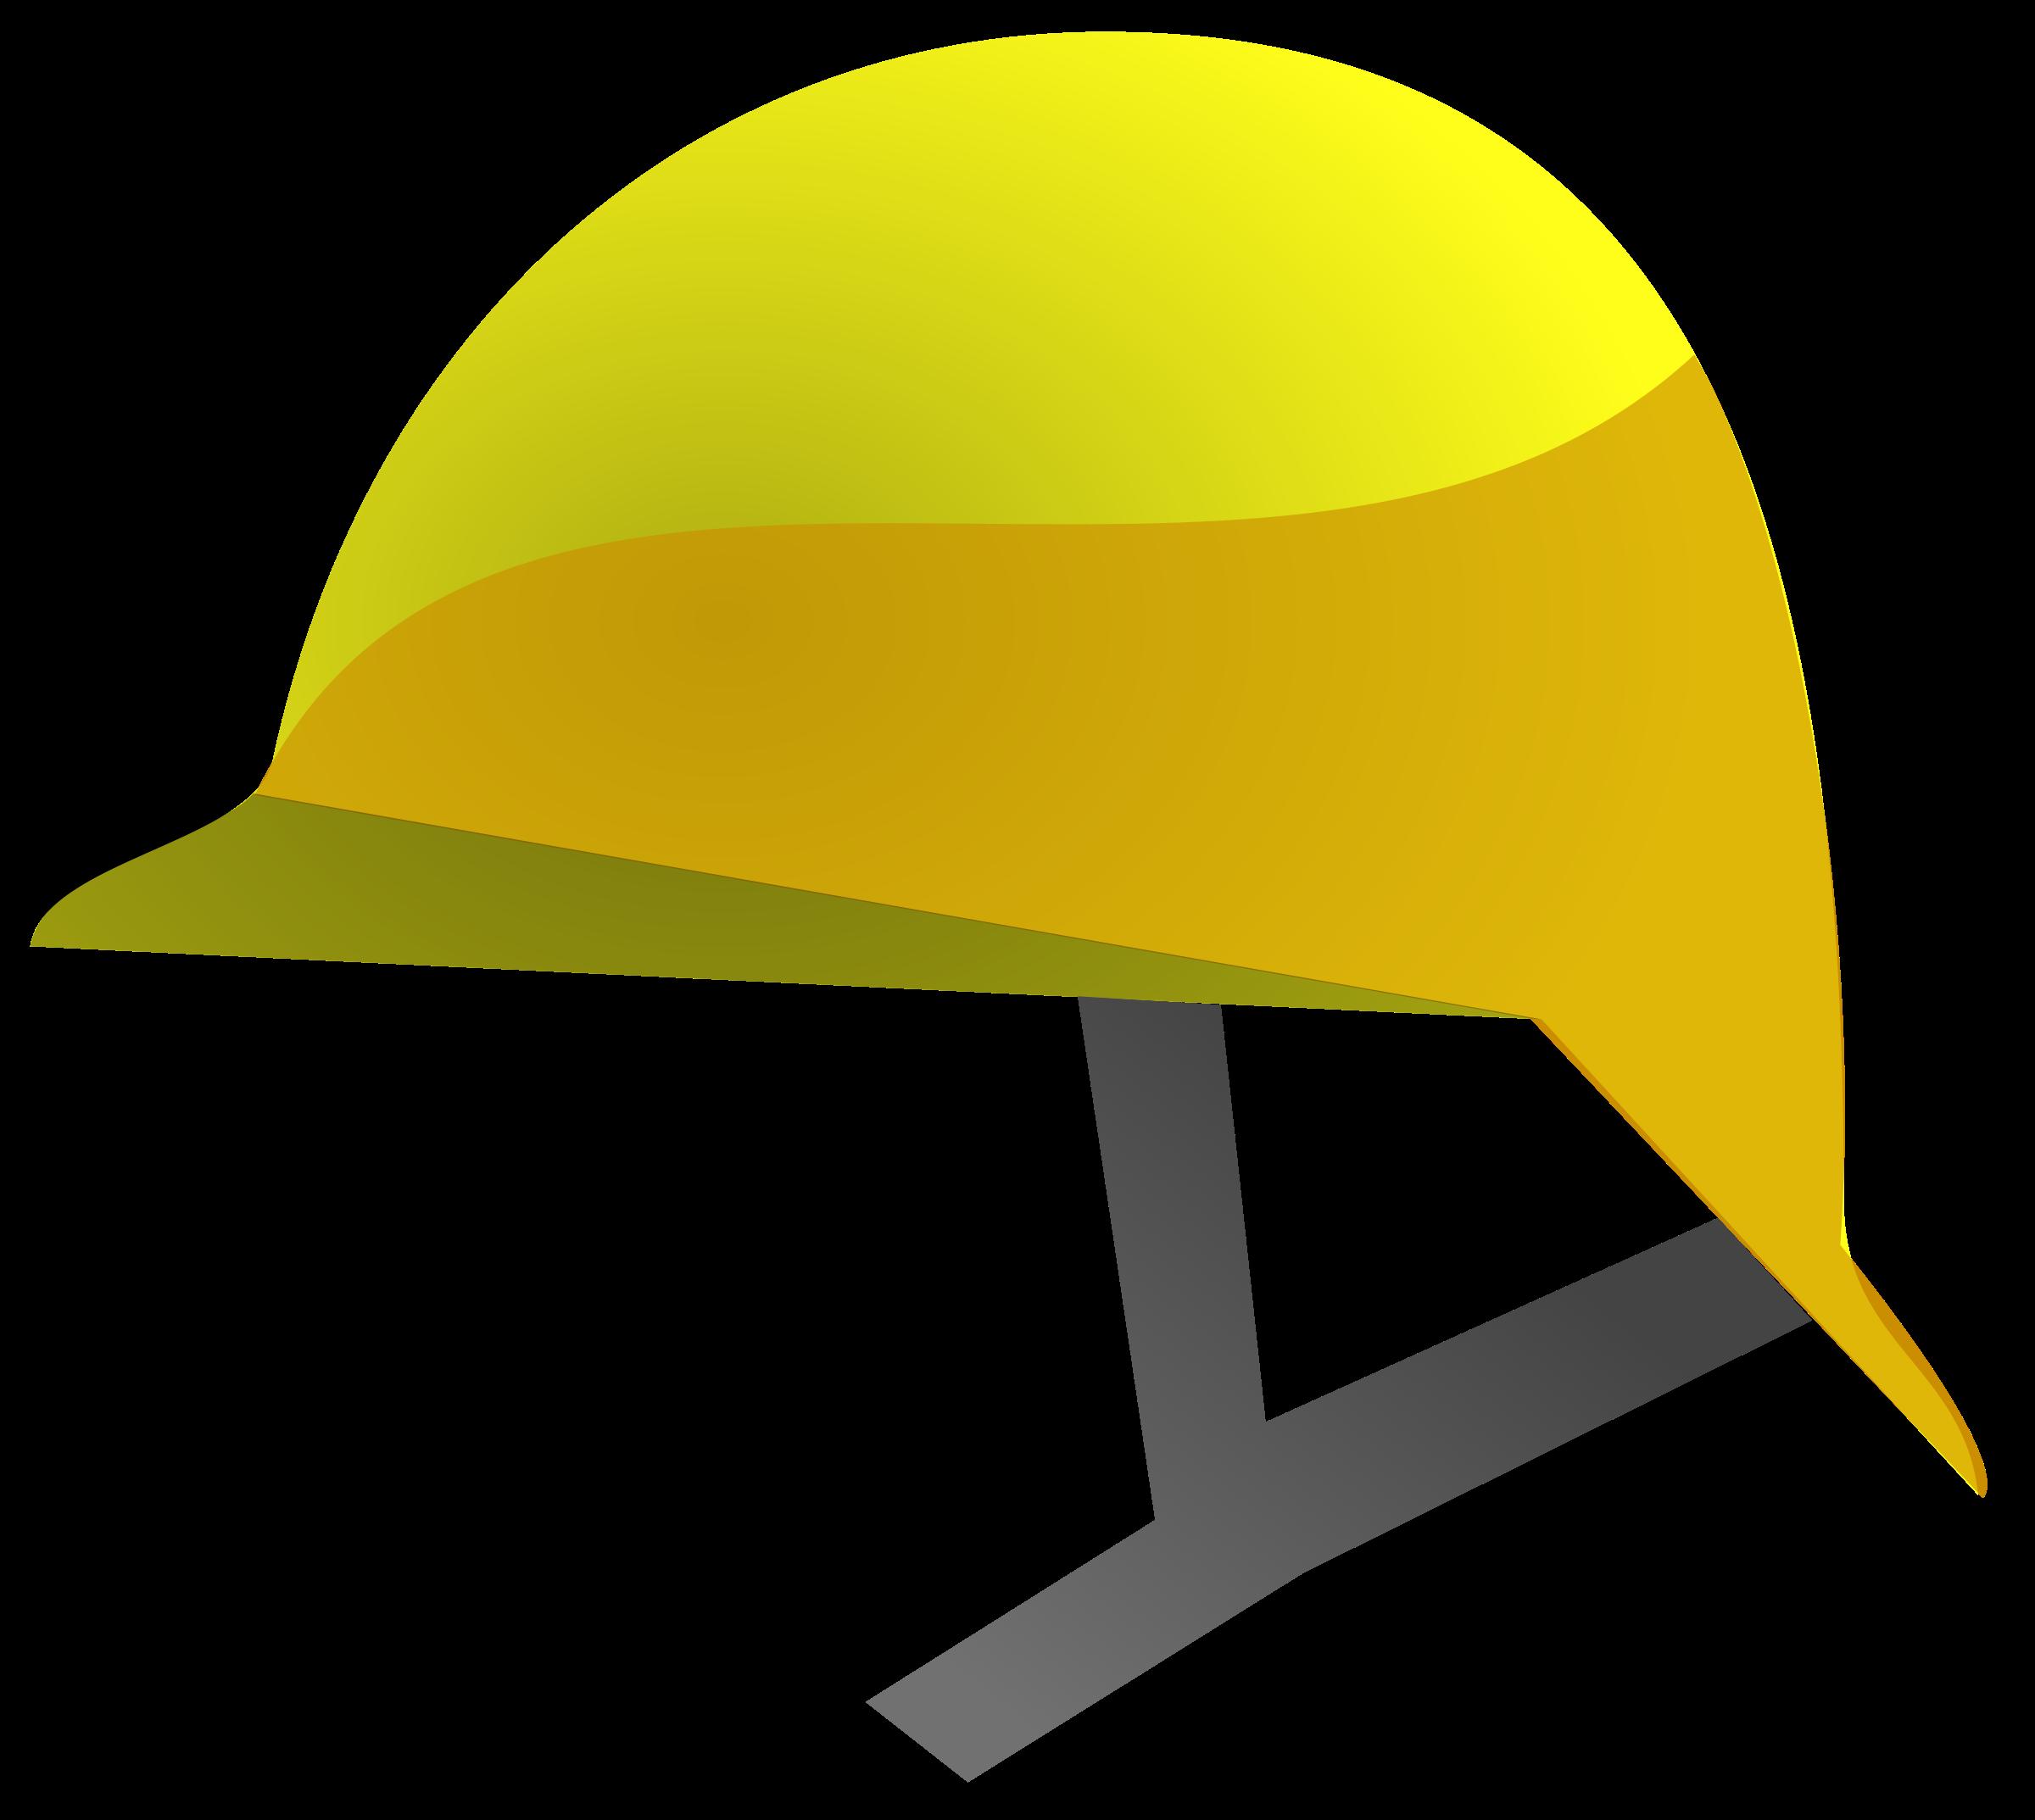 Helmet safety equipment